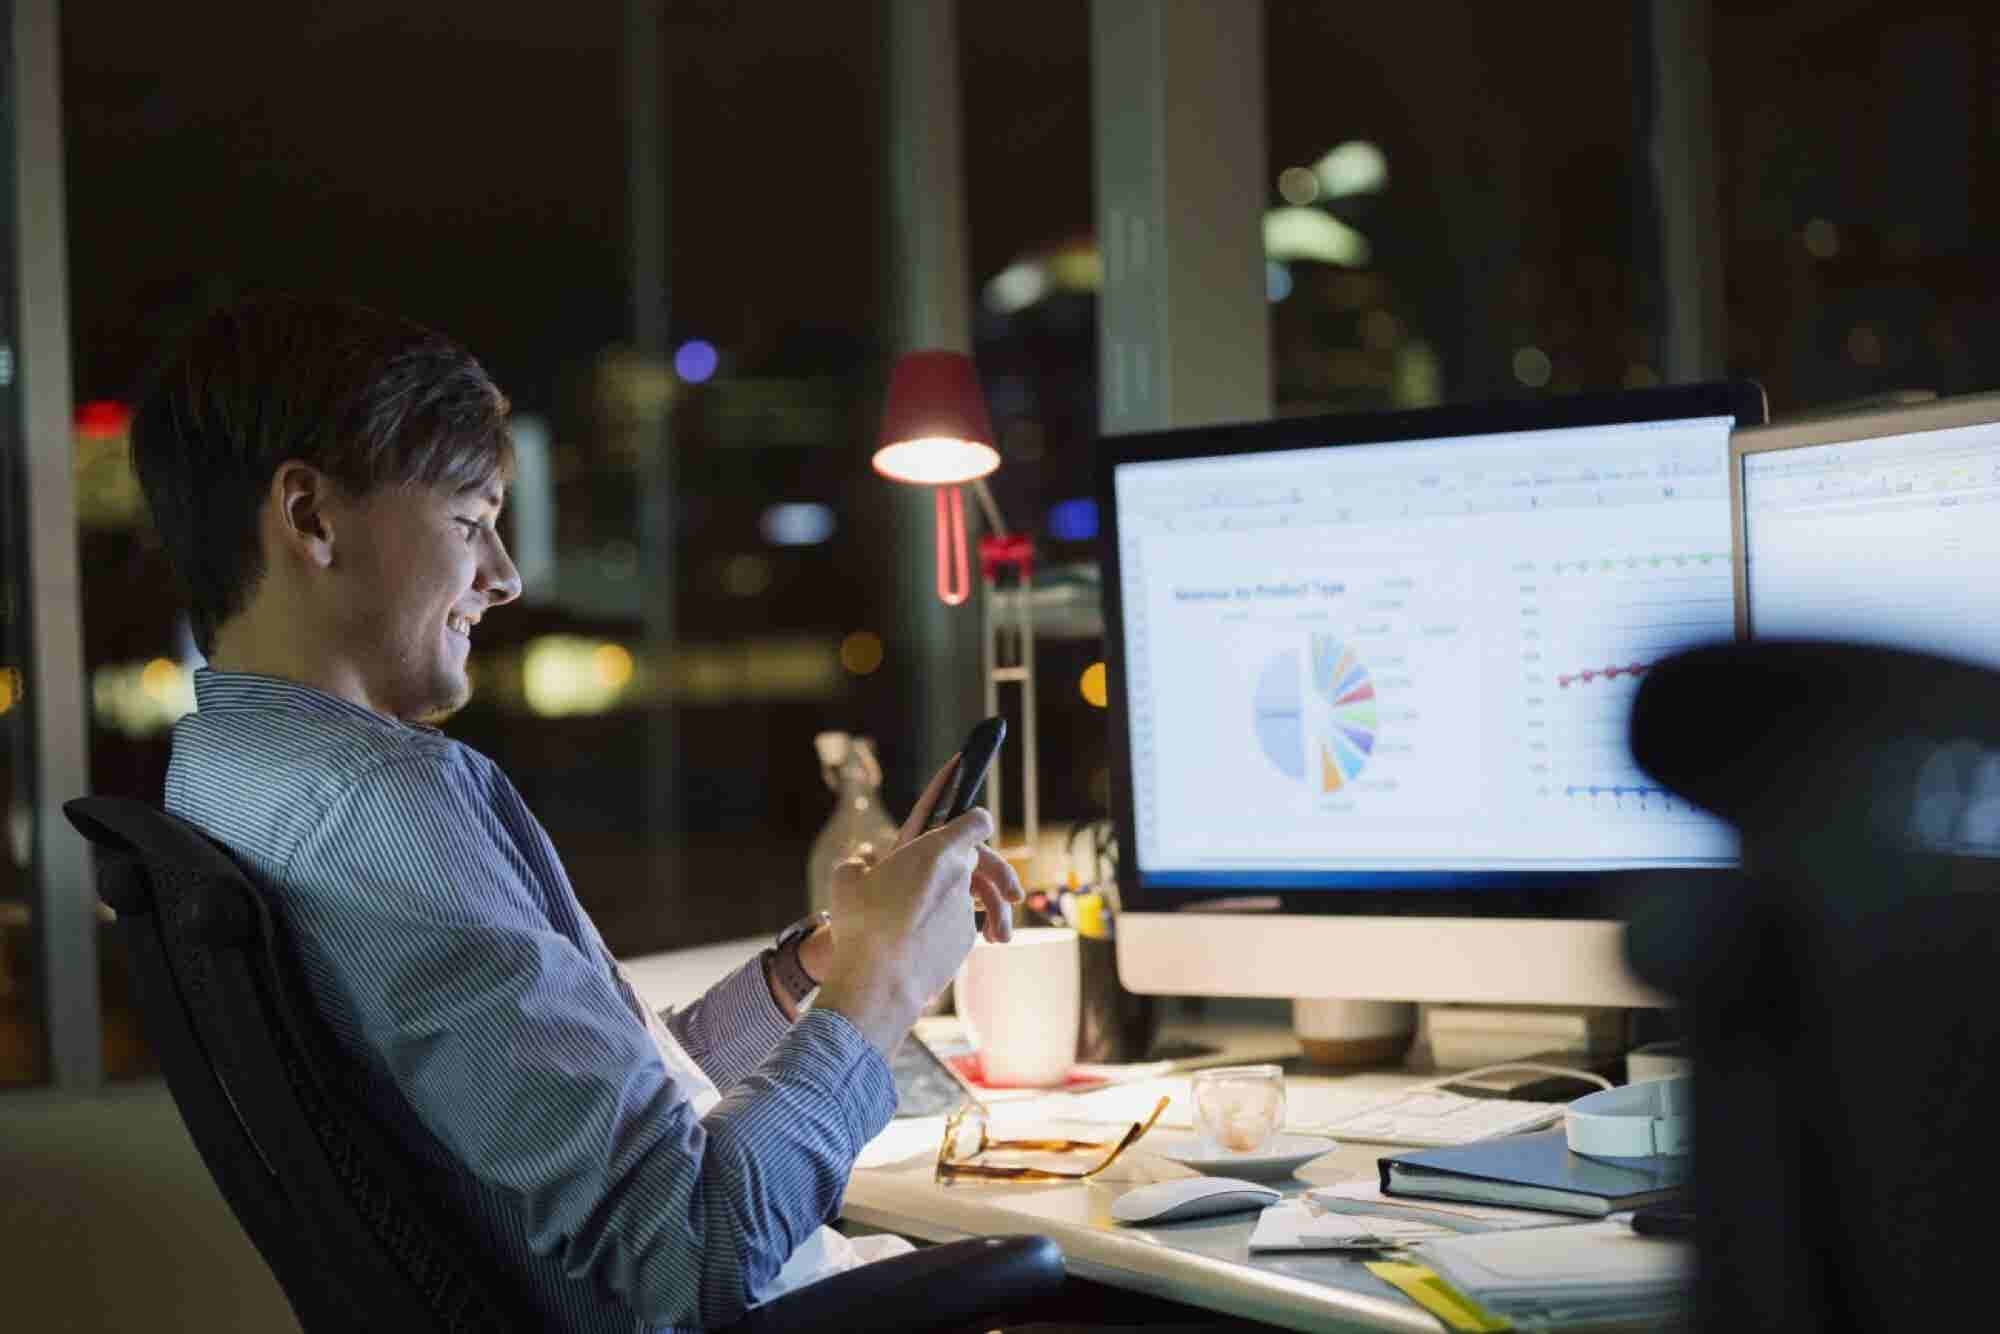 Low Productivity? You May Need a Digital Detox.